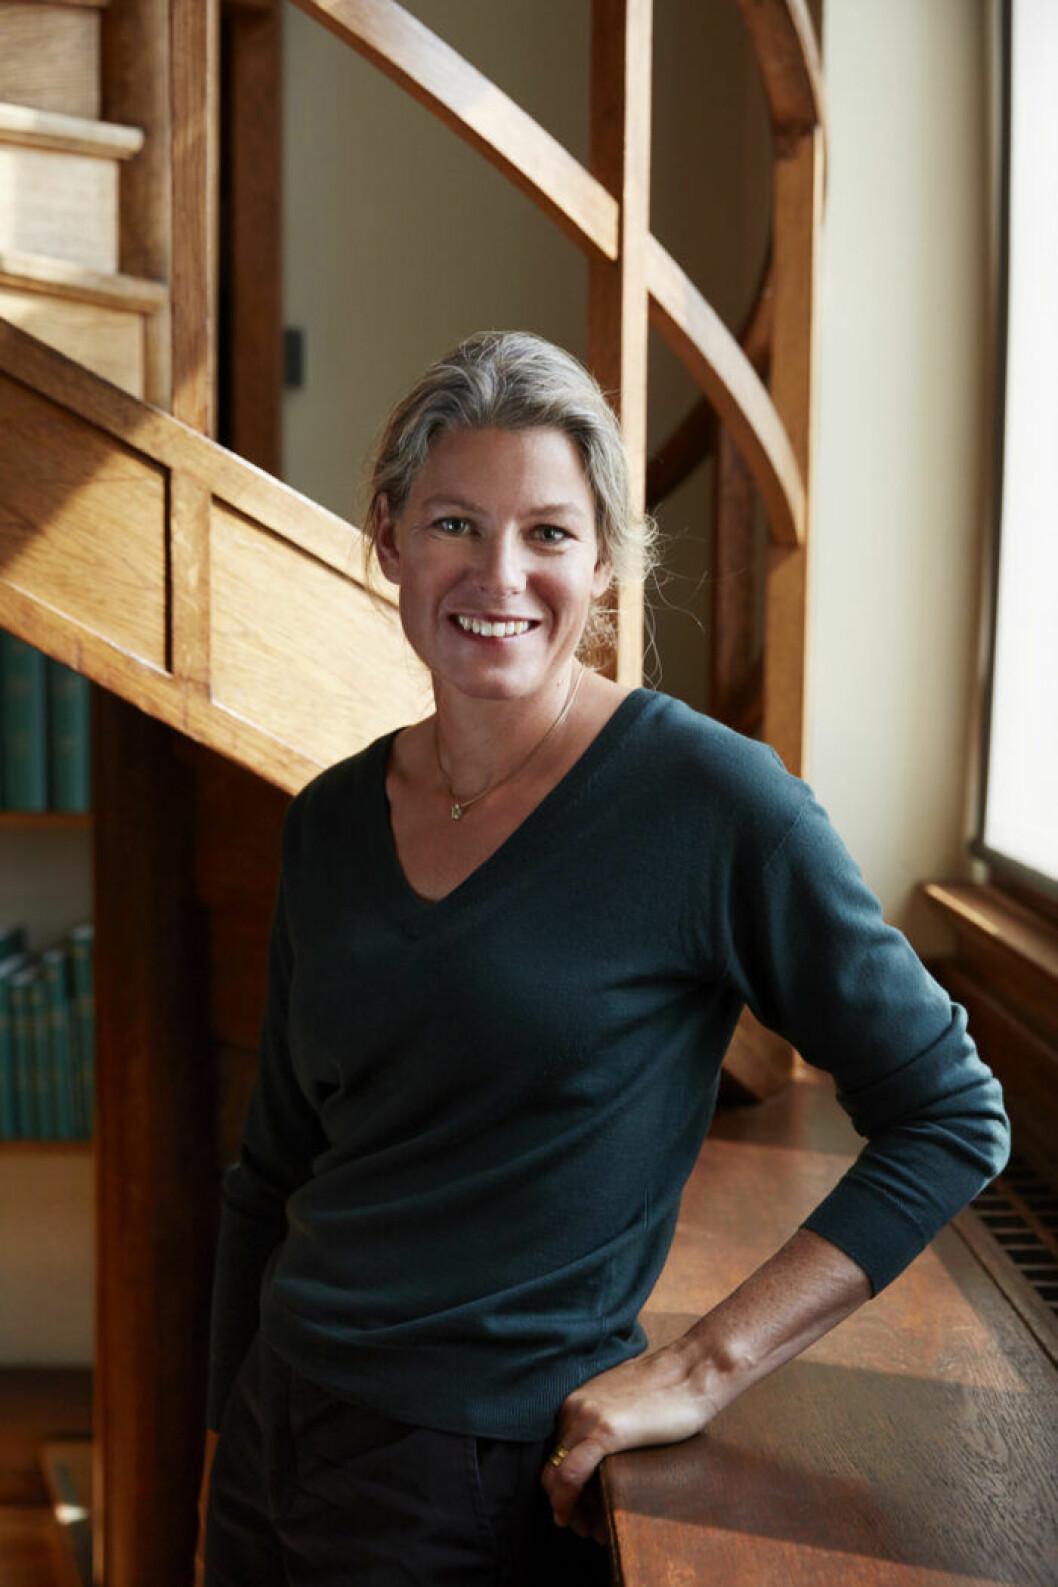 Emma Olbers är Årets Designer på ELLE Deco Design Awards